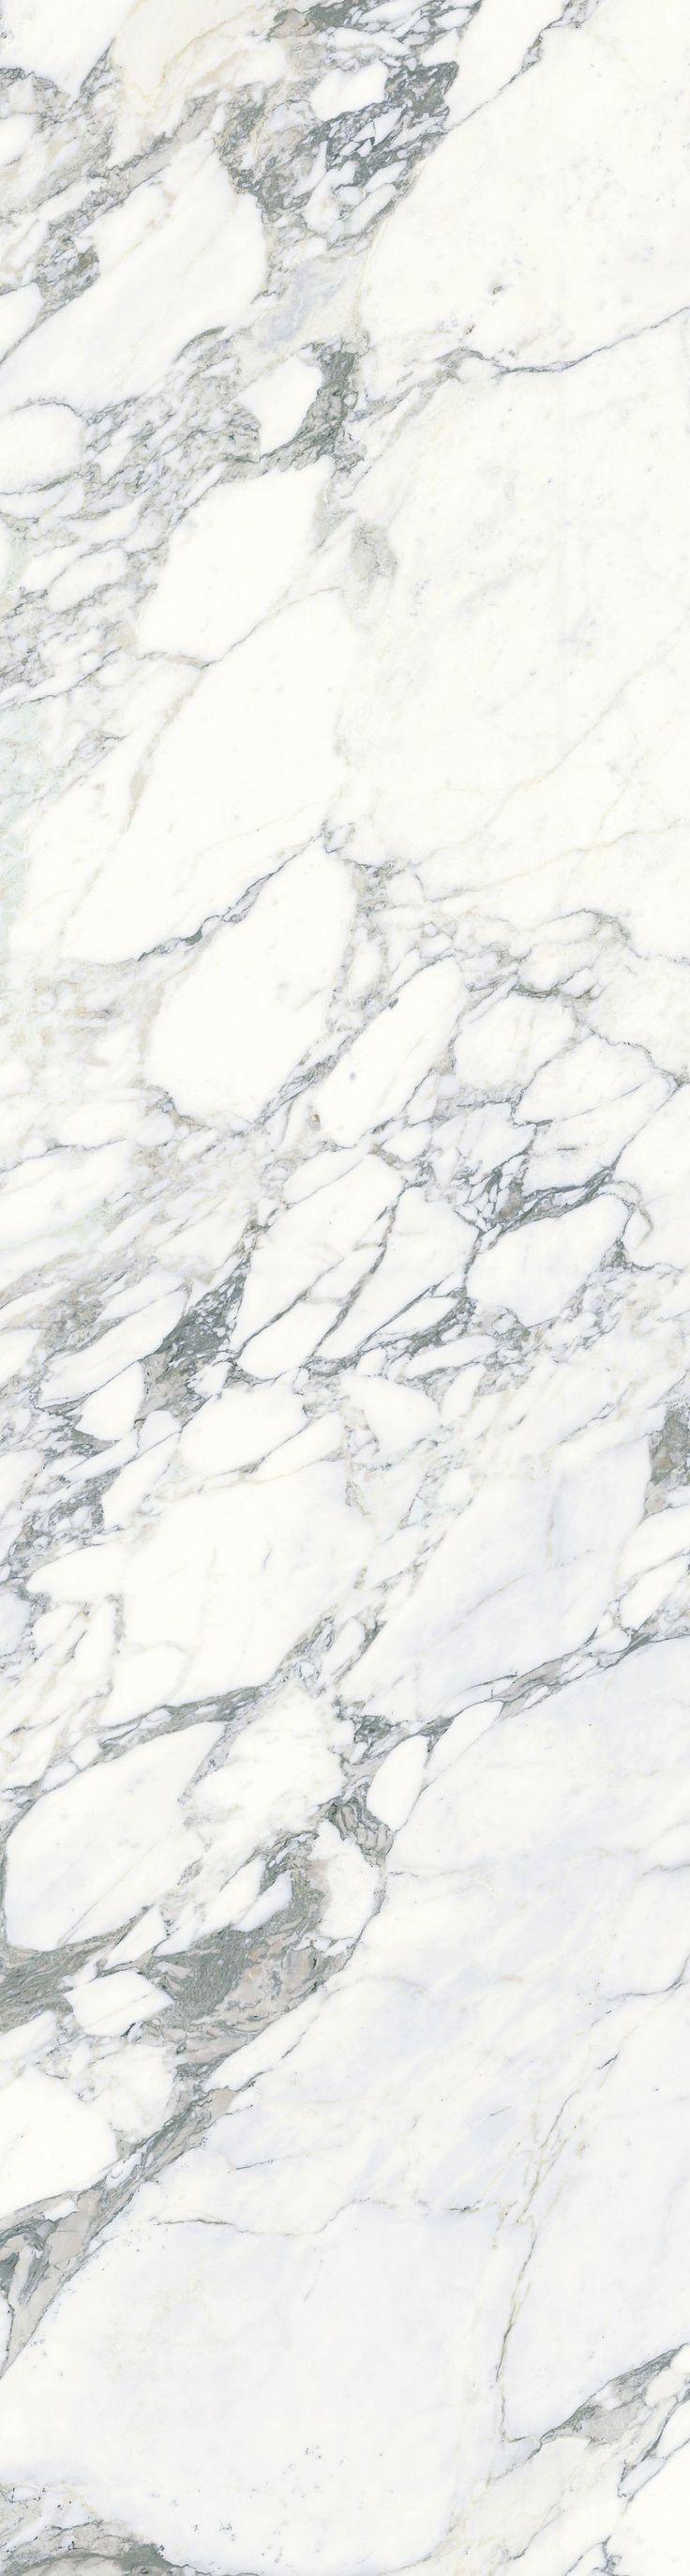 Marble Wallpaper Cute Gambar Wallpaper